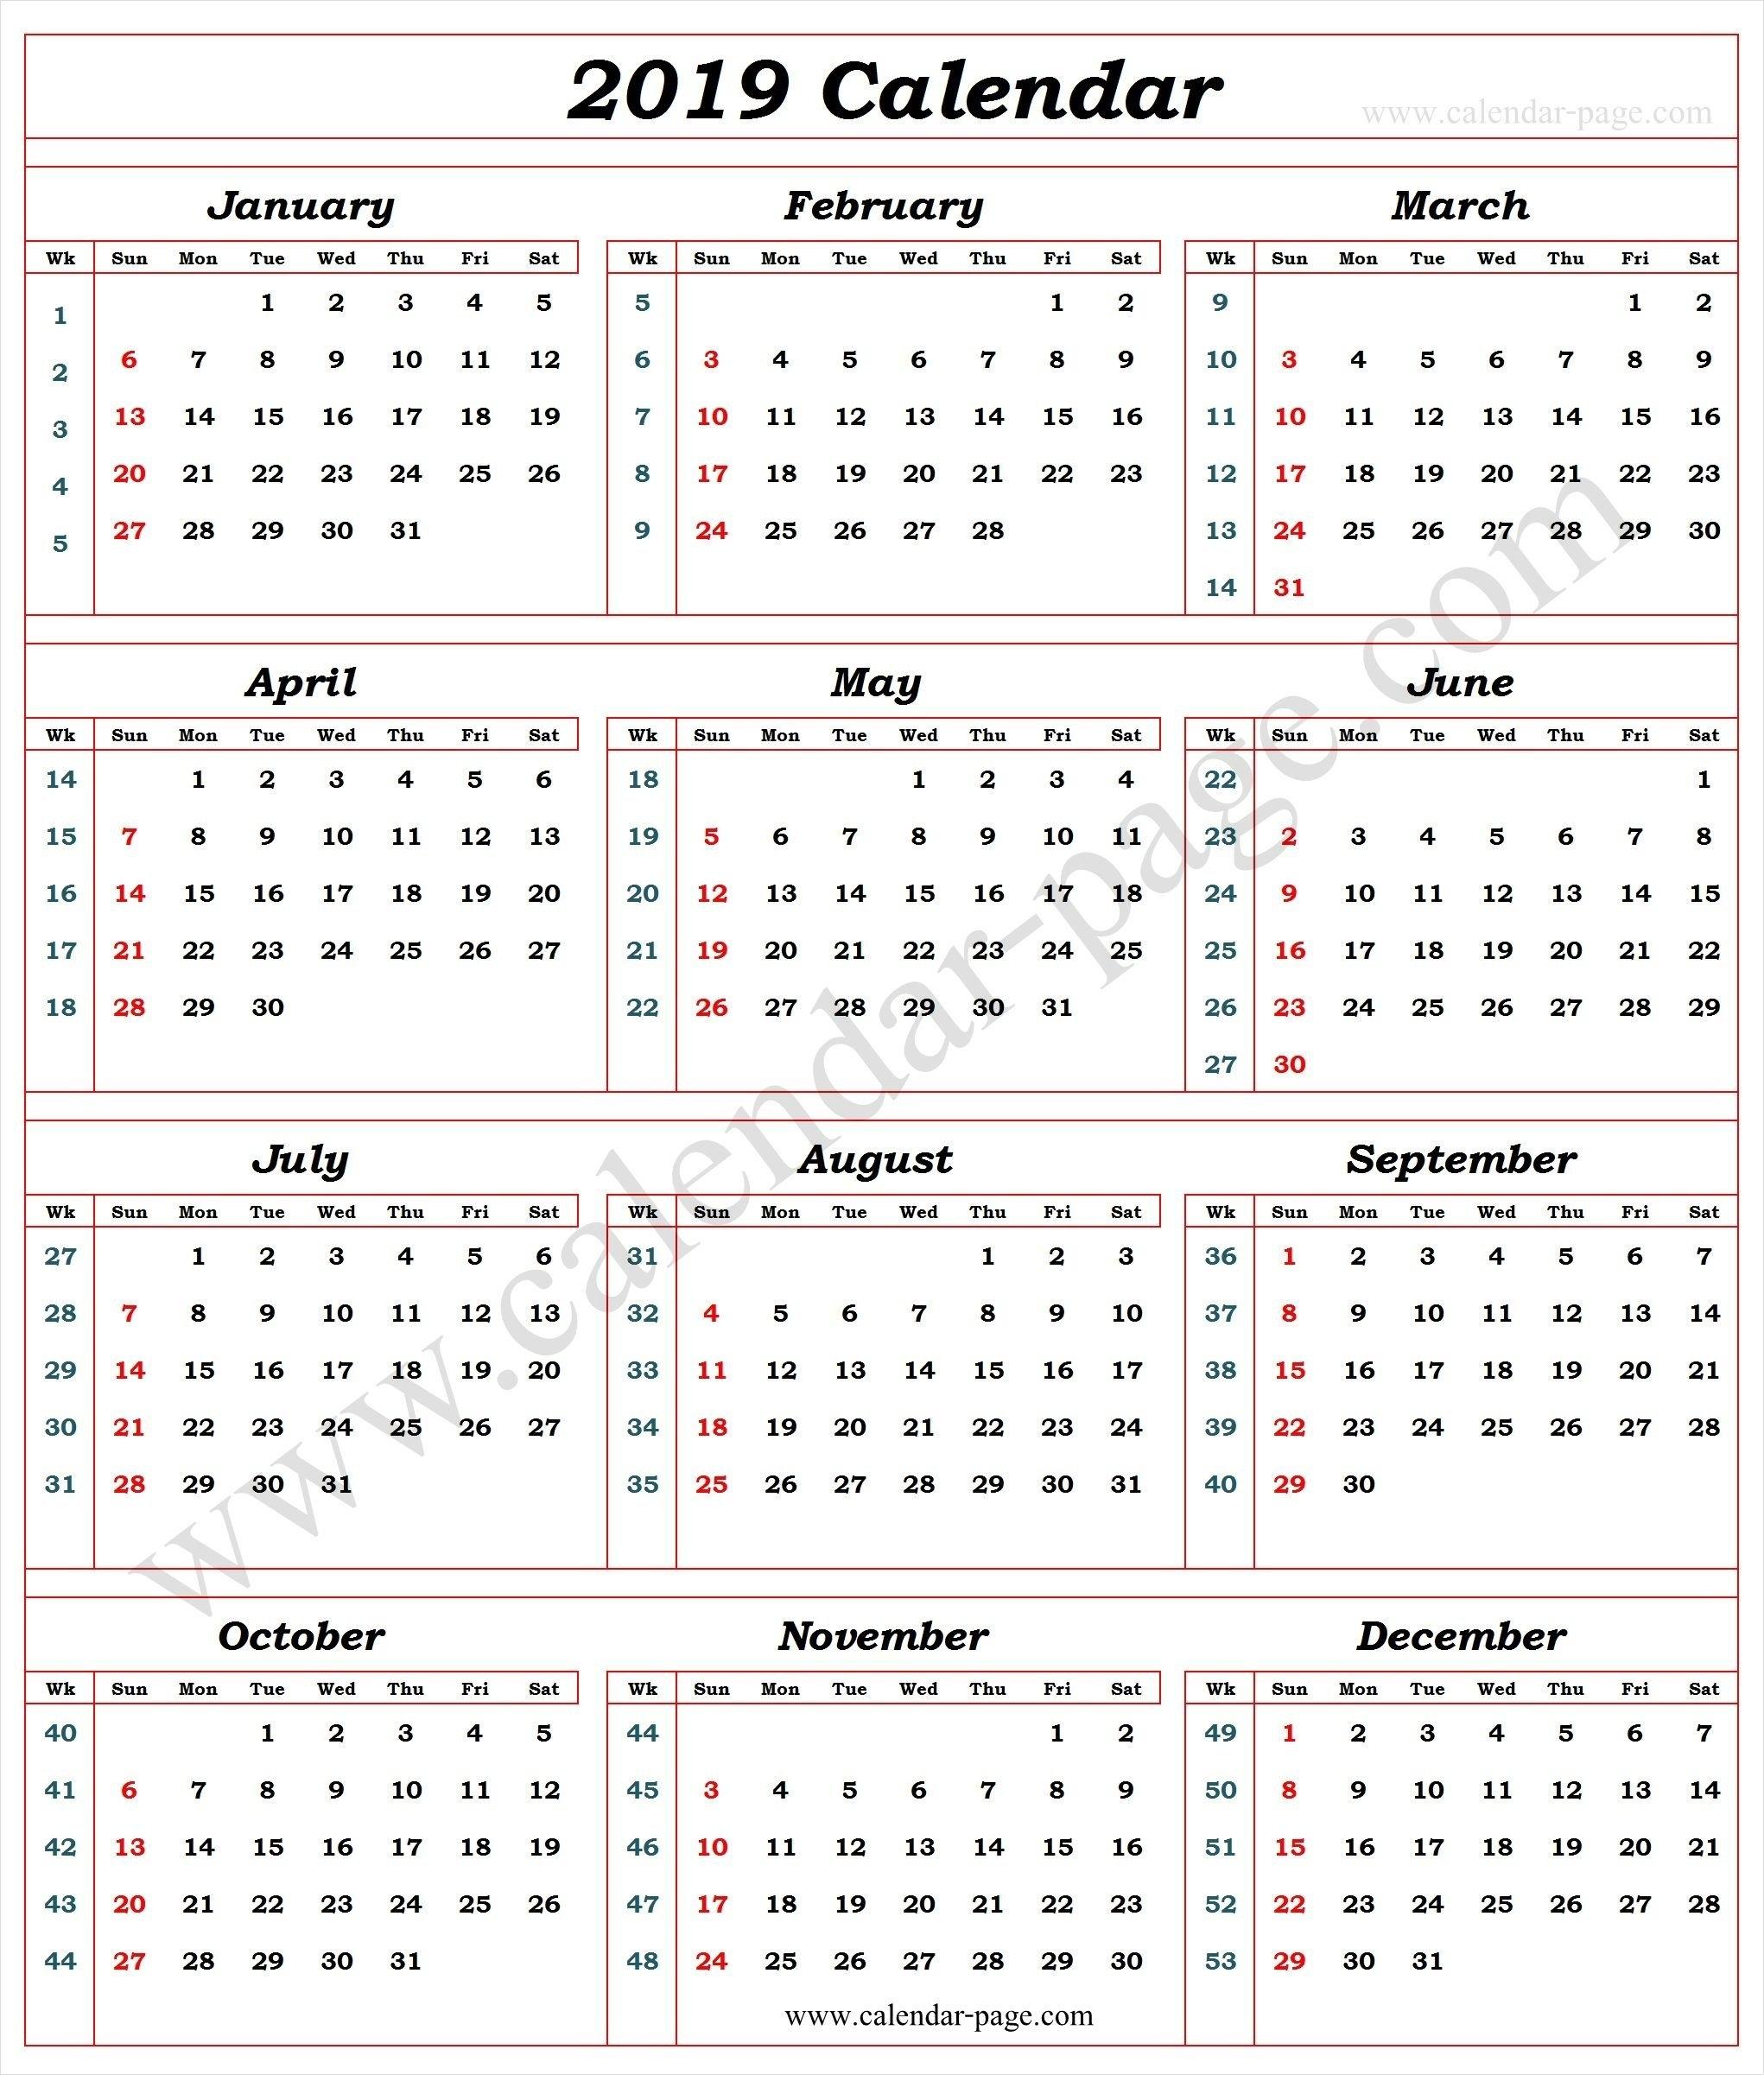 Calendar 2019 With Week Numbers | 2019 Calendar Template | Pinterest Calendar Week 15 2019